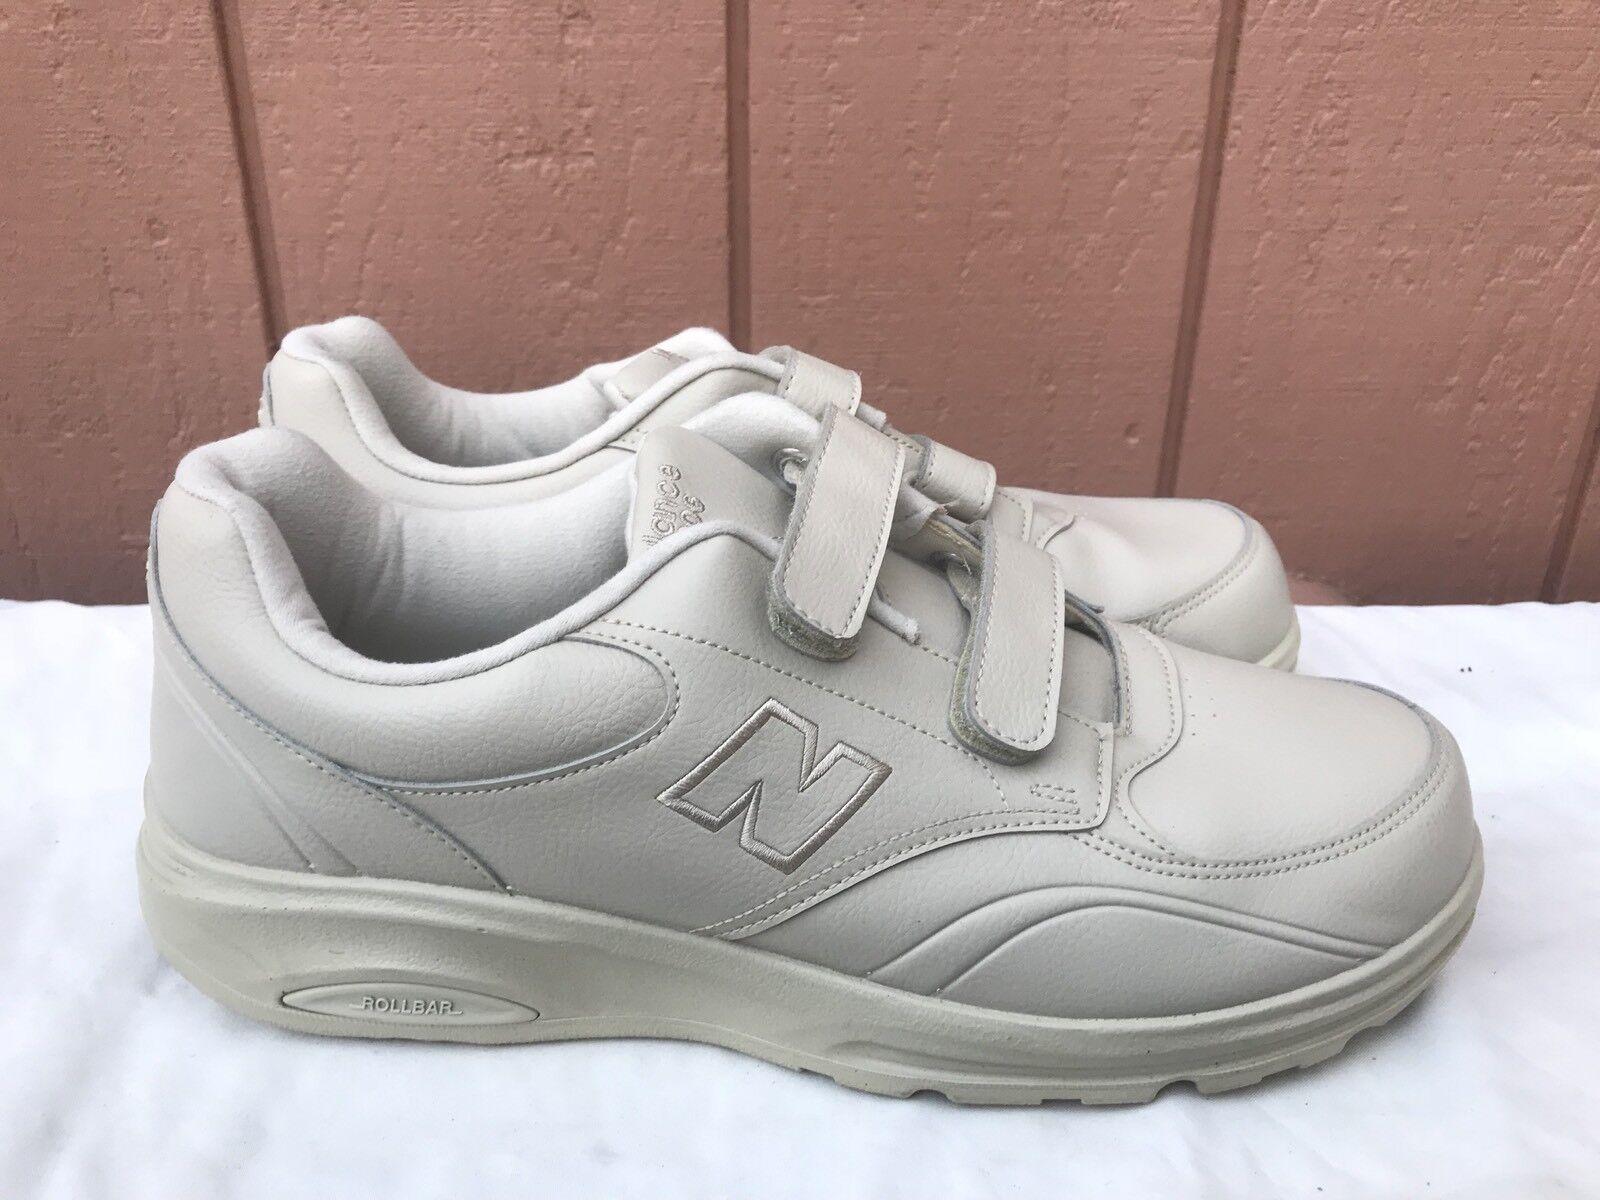 NEW New Balance Men's MW812VK Beige Leather Walking Shoe Sz US 11.5 2E A1